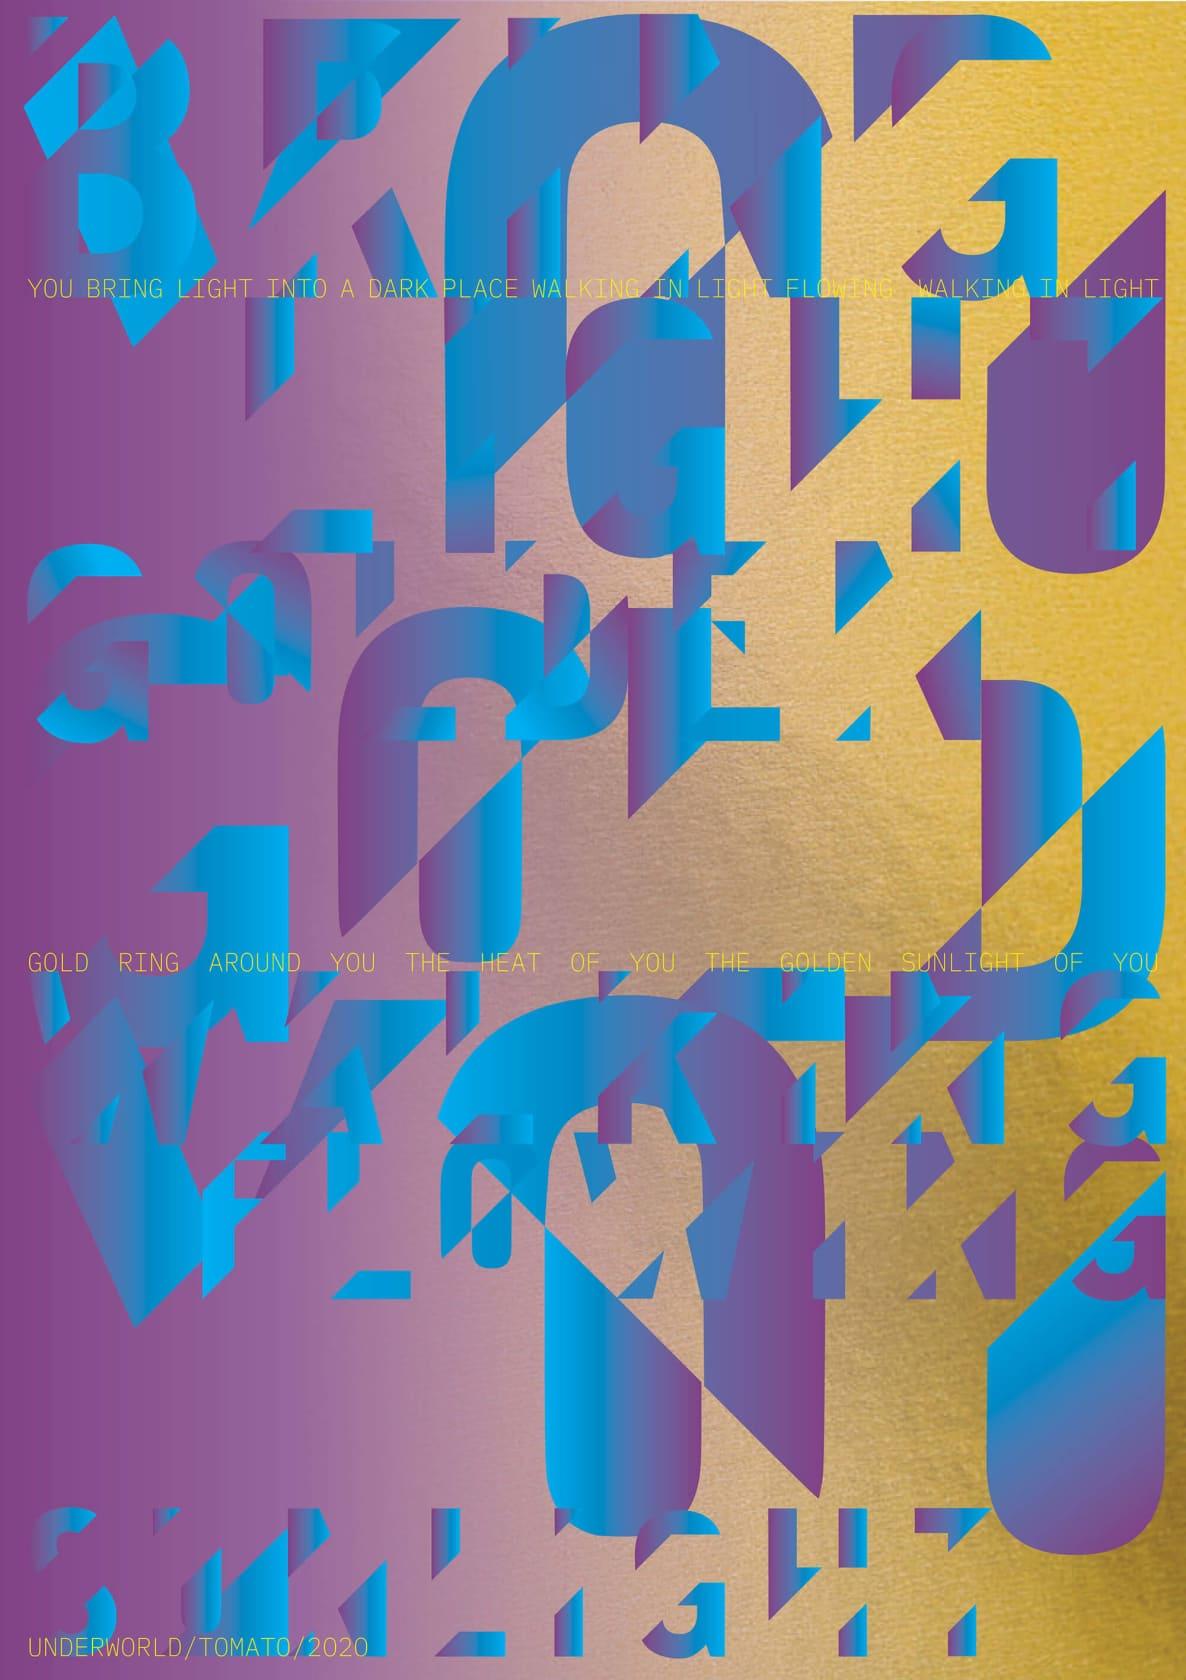 SIMON TAYLOR & UNDERWORLD You Bring Light In 4 colour screenprint onto Fenner Bright Gold